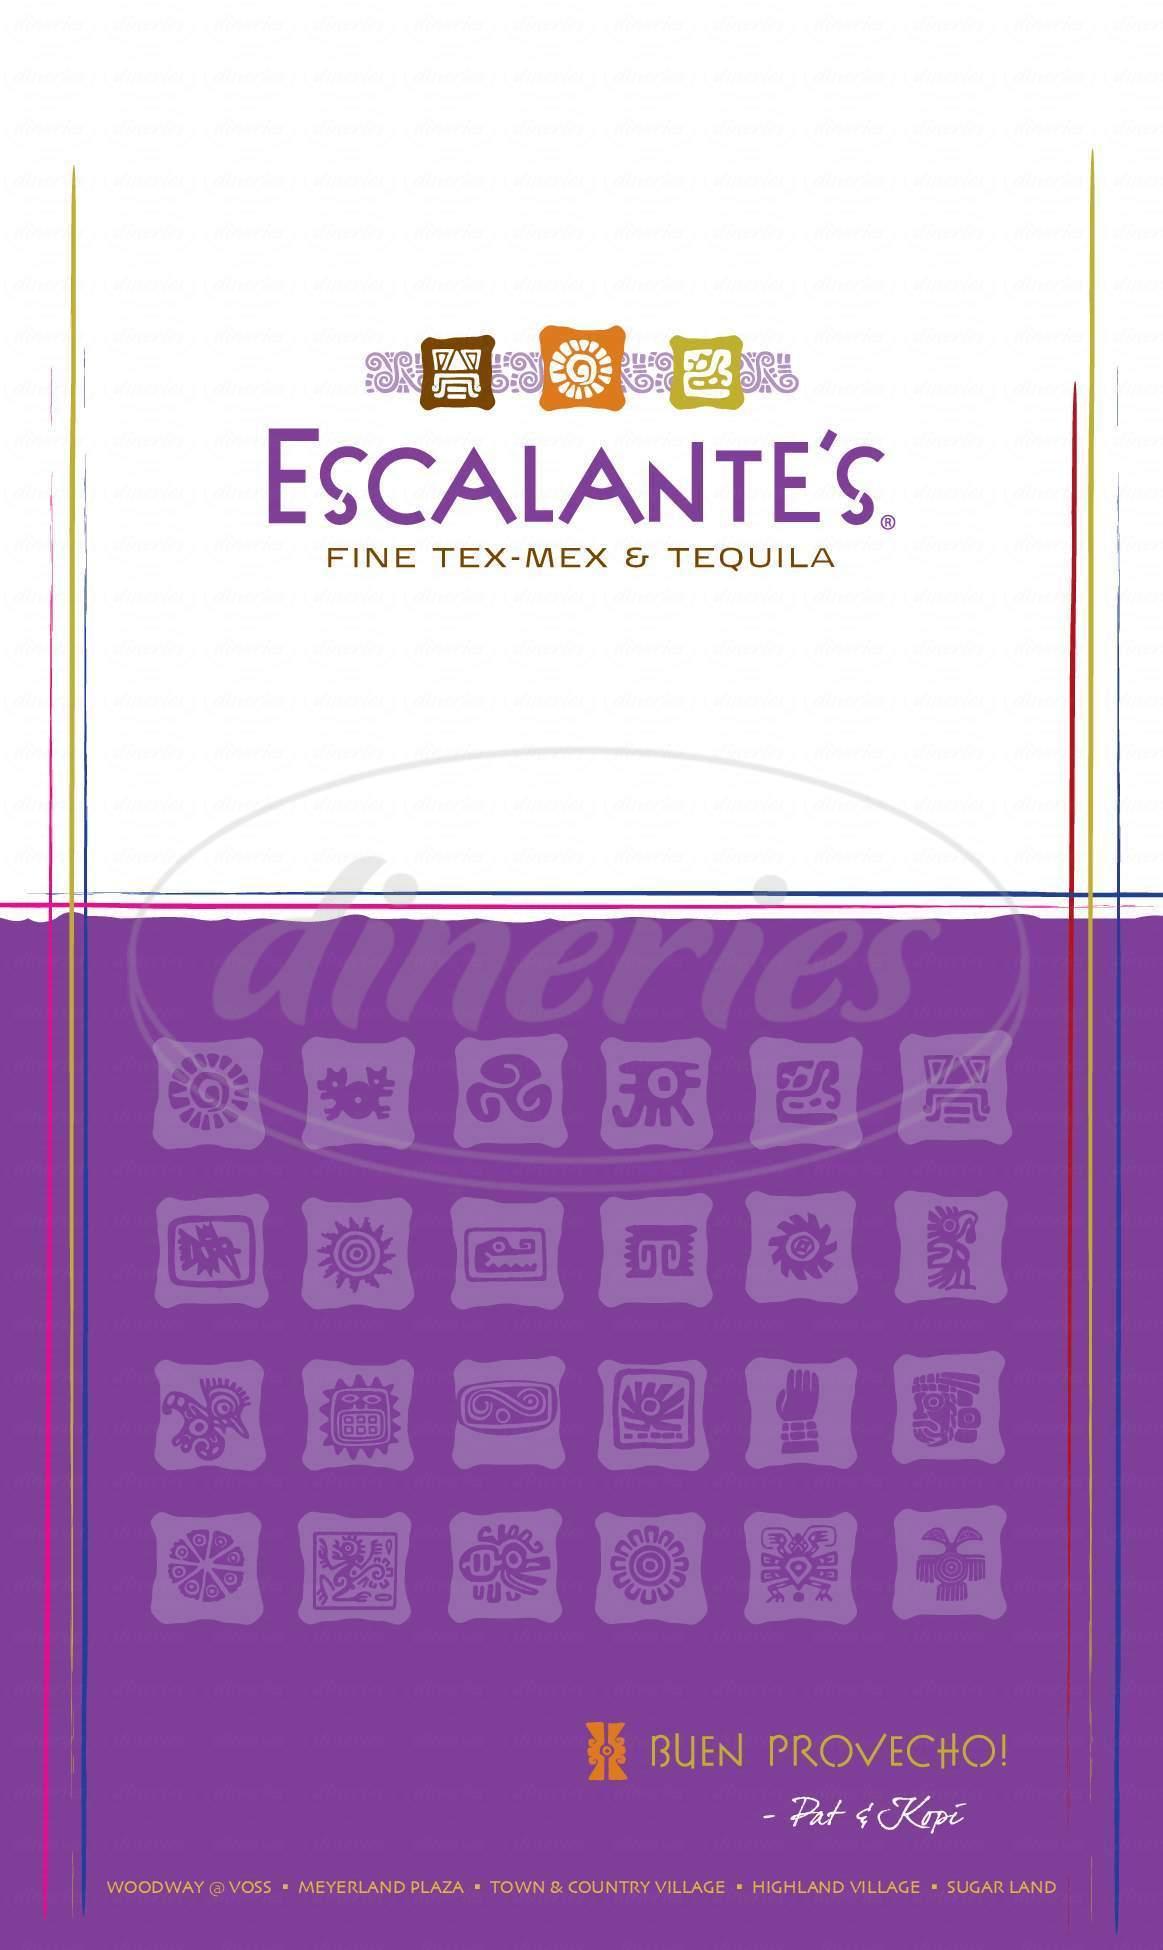 menu for Escalante's Mexican Grille